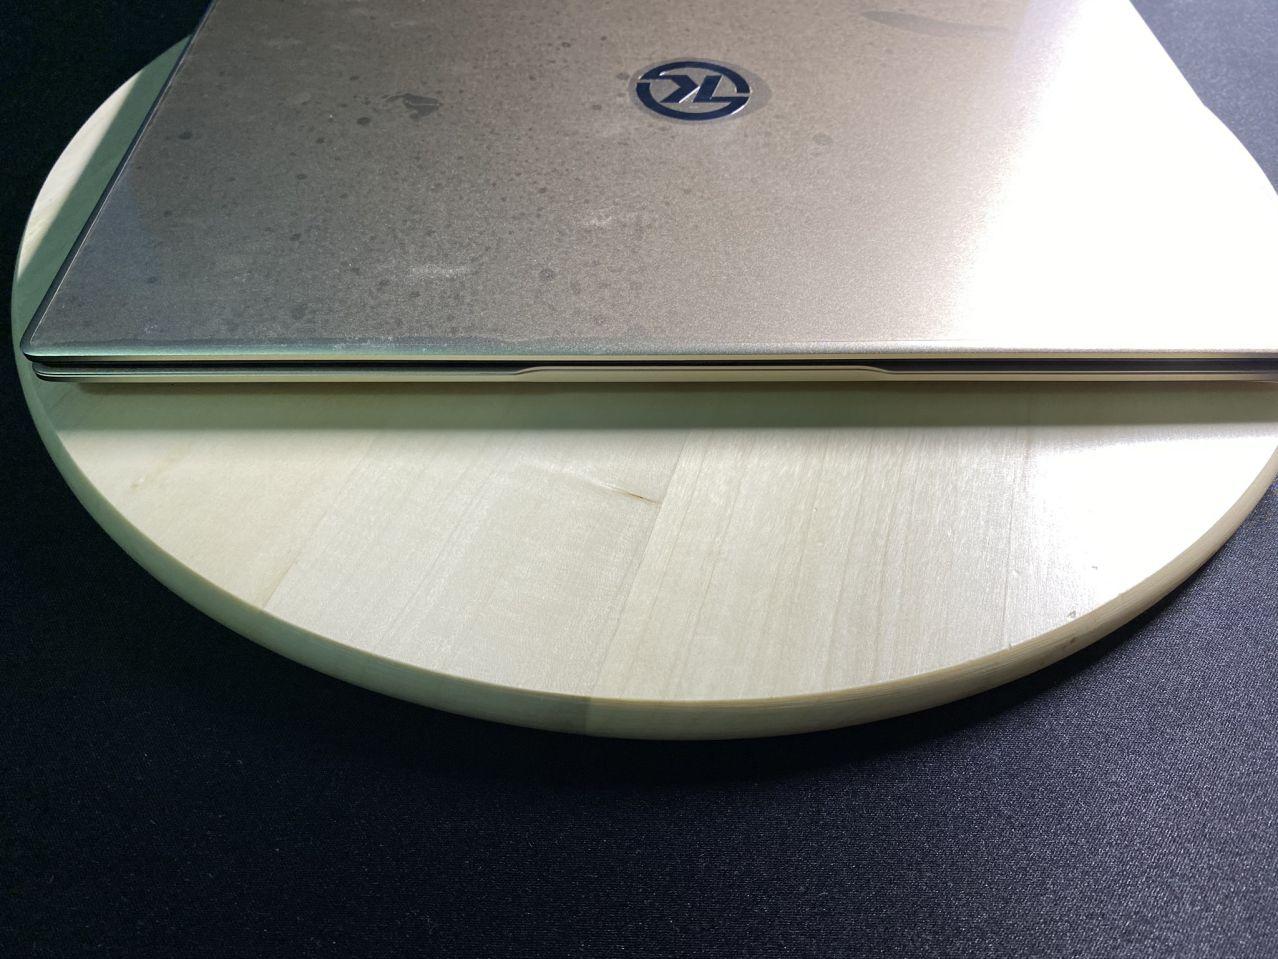 recensione-kuu-k2-19 Recensione KUU K2: Ultrabook Cinese 2020